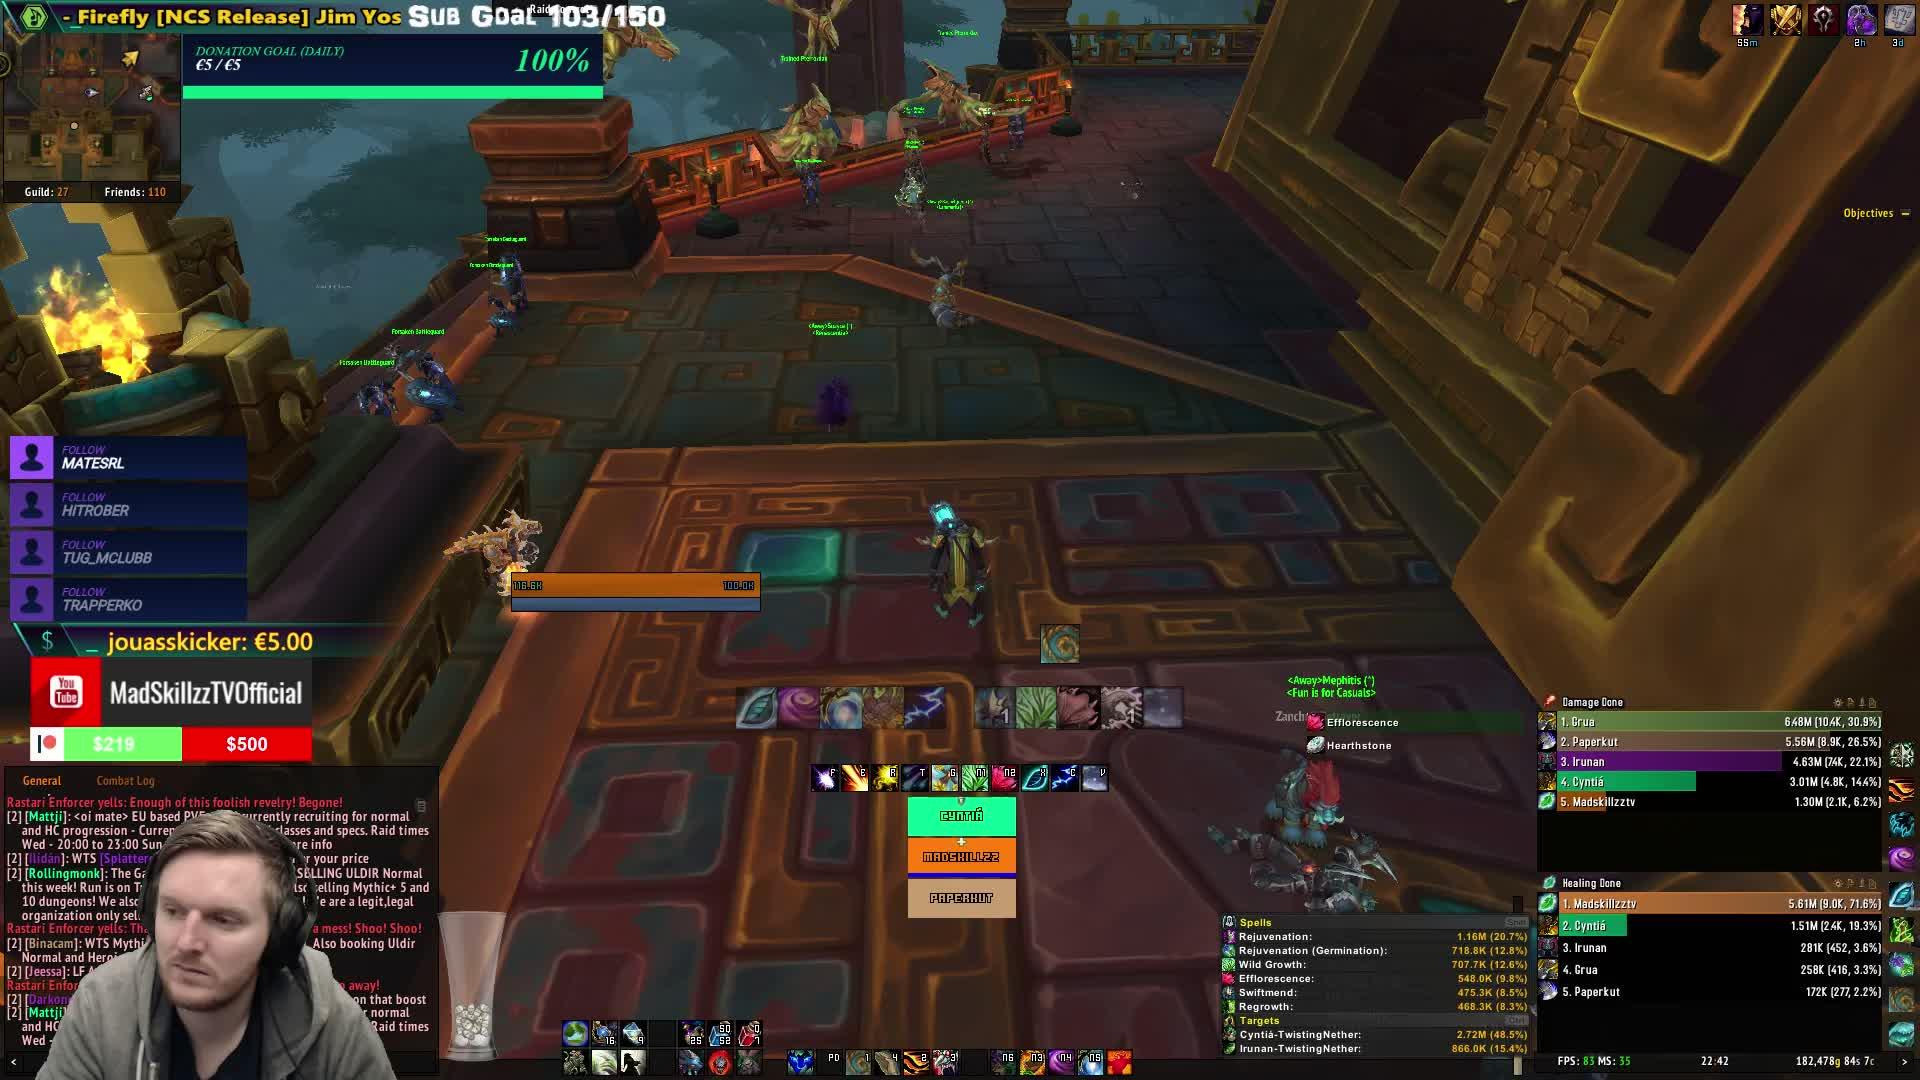 MadSkillzzTV - BfA Resto druid M+ !main !UI videos OUT - Twitch